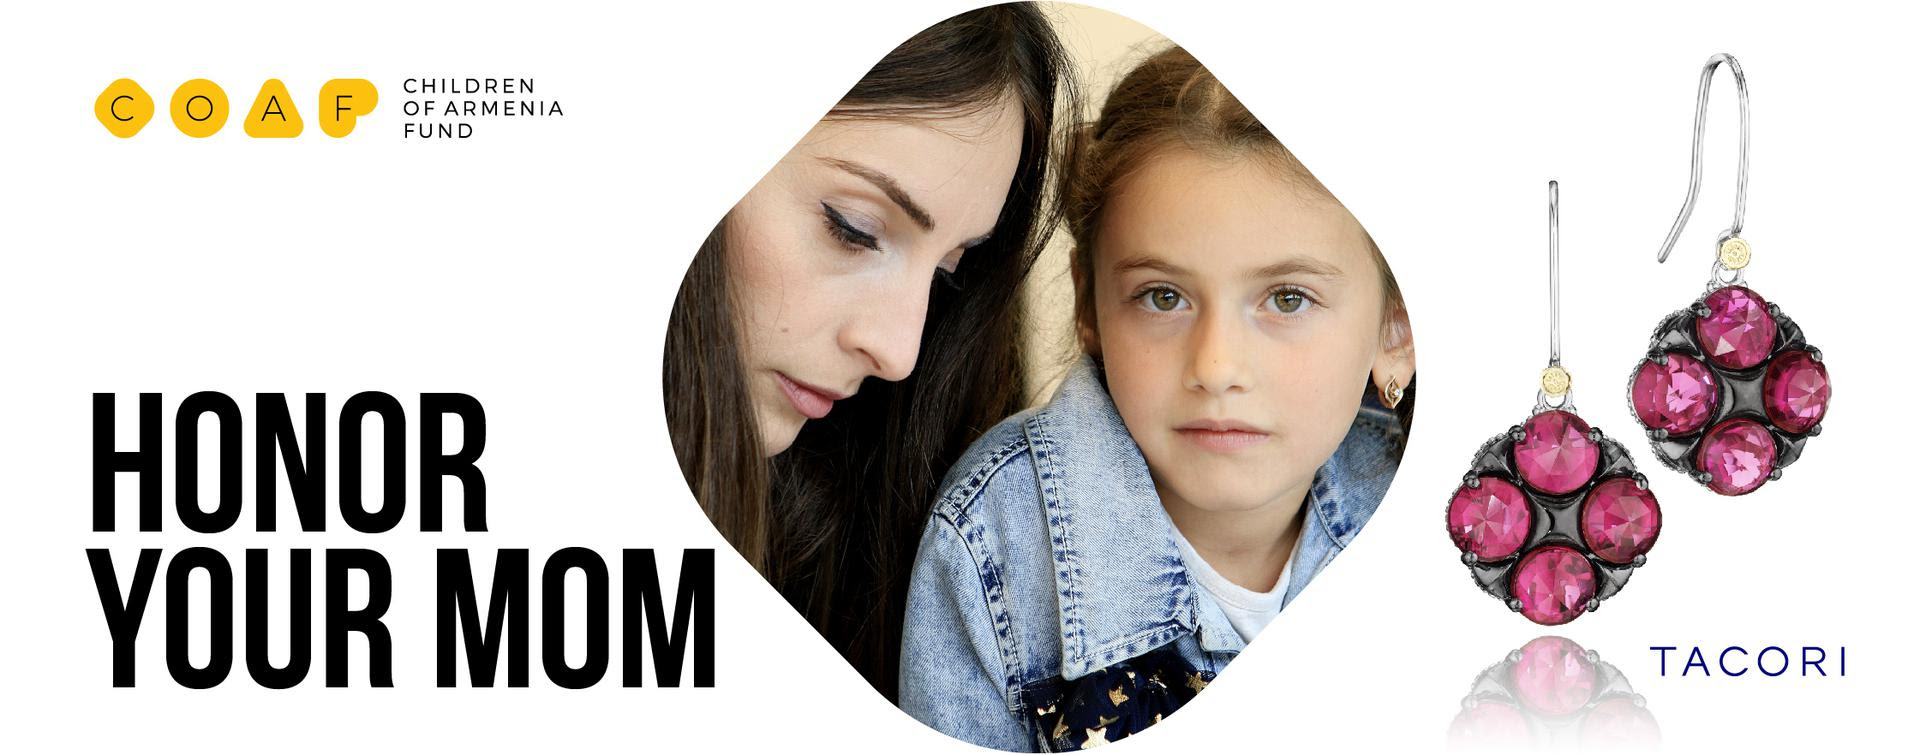 Children of Armenia Fund (COAF)